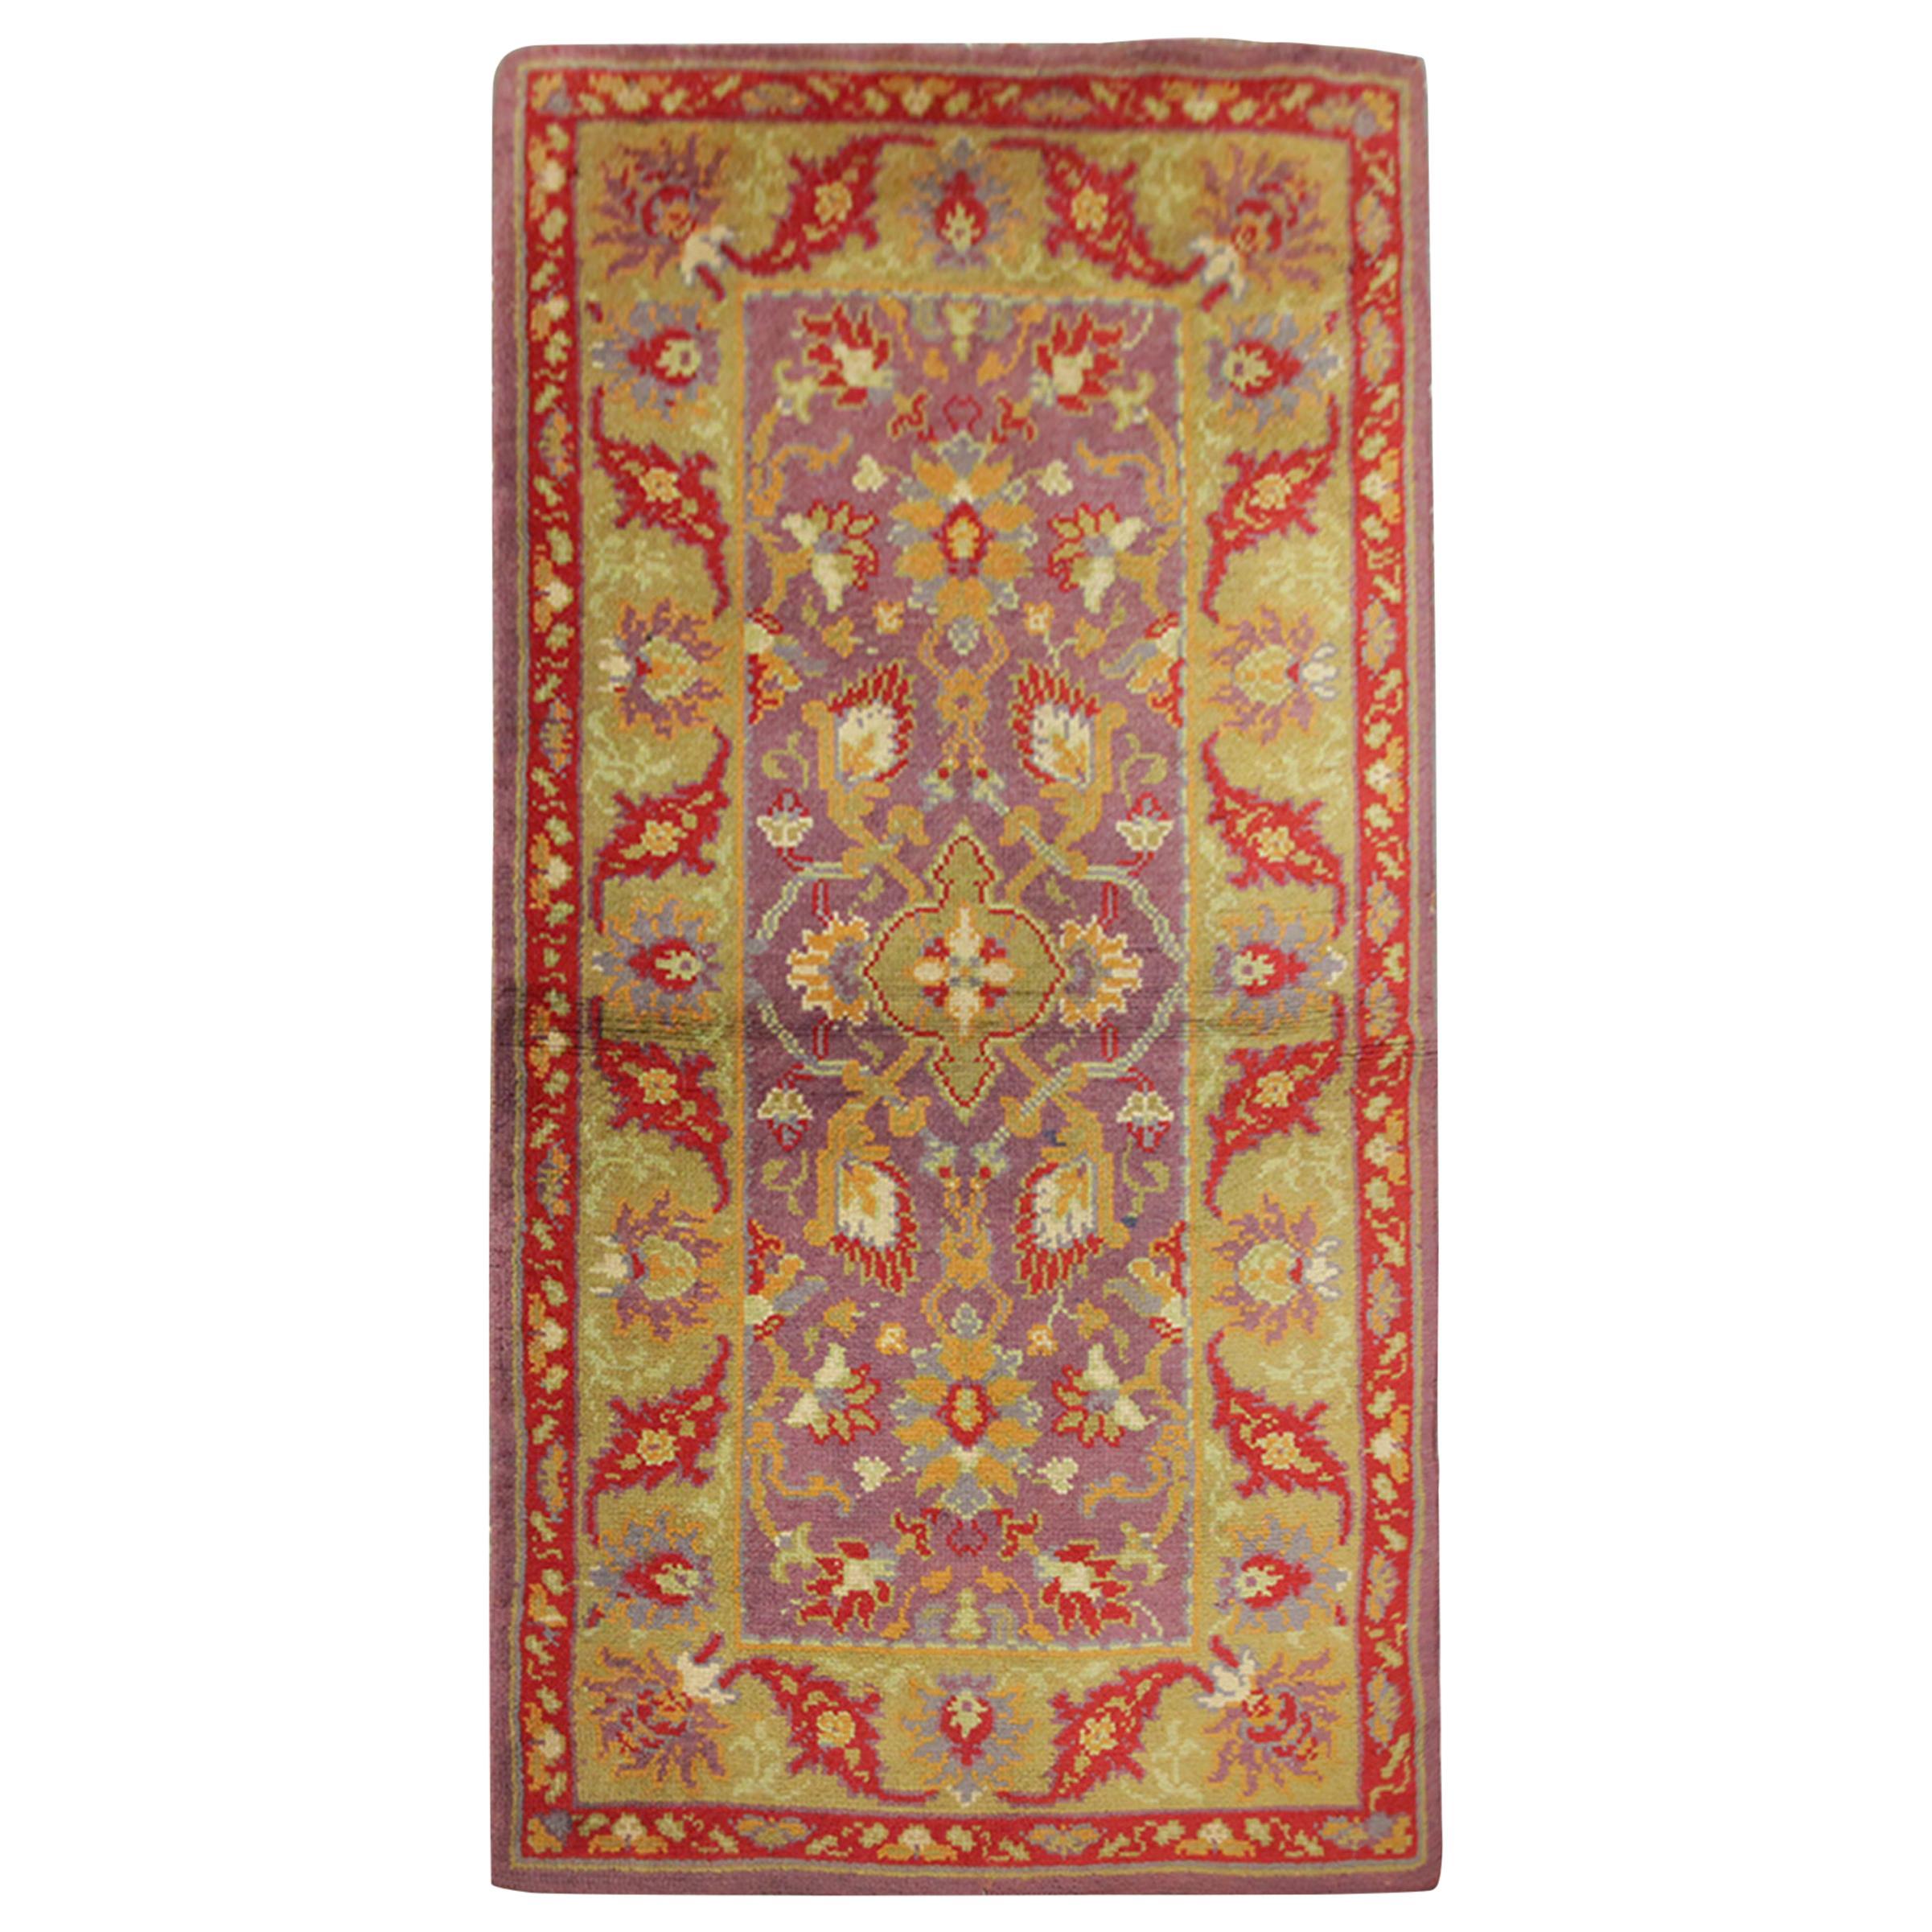 Pair of Carpet Vintage Irish Donegal Rugs, Purple/ Yellow Living Room Rugs Sale